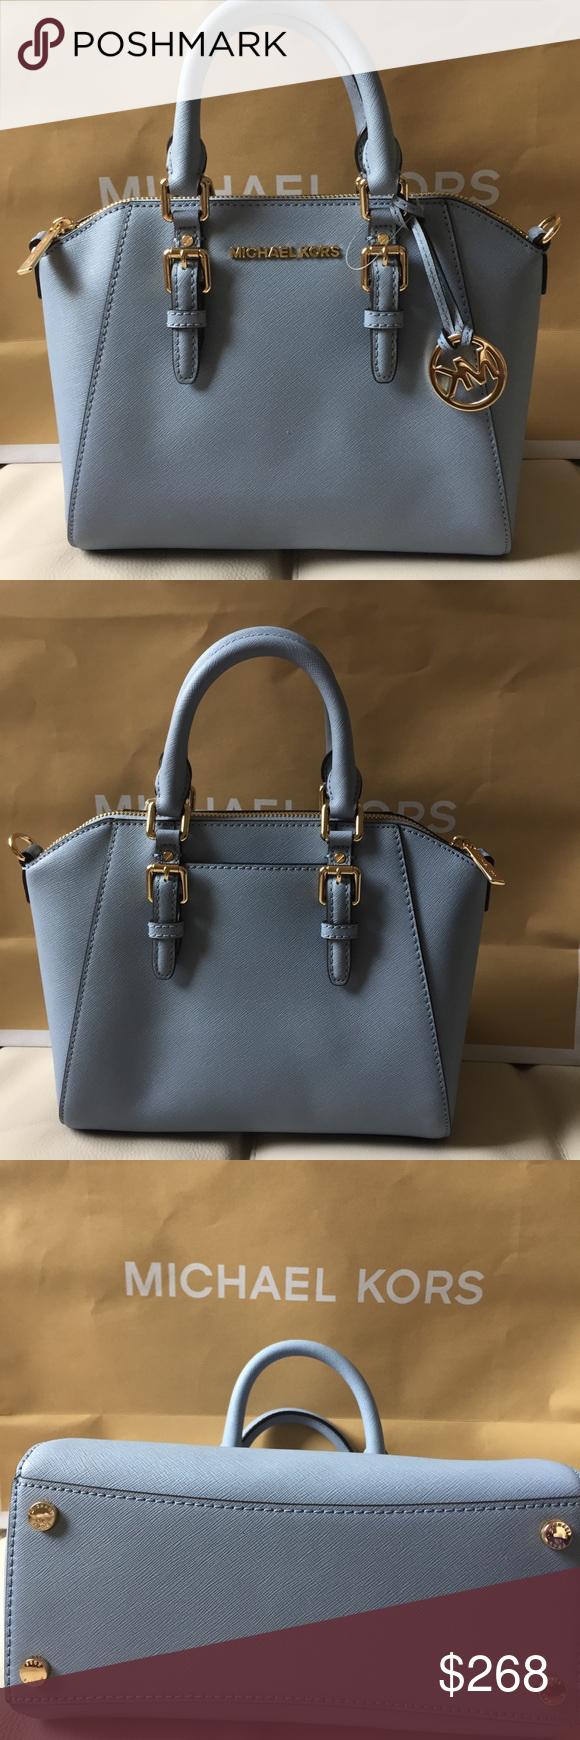 67c10cb1f539 Spotted while shopping on Poshmark  NWT MICHAEL KORS MEDIUM CIARA PALE BLUE  SATCHEL!  poshmark  fashion  shopping  style  Michael Kors  Handbags